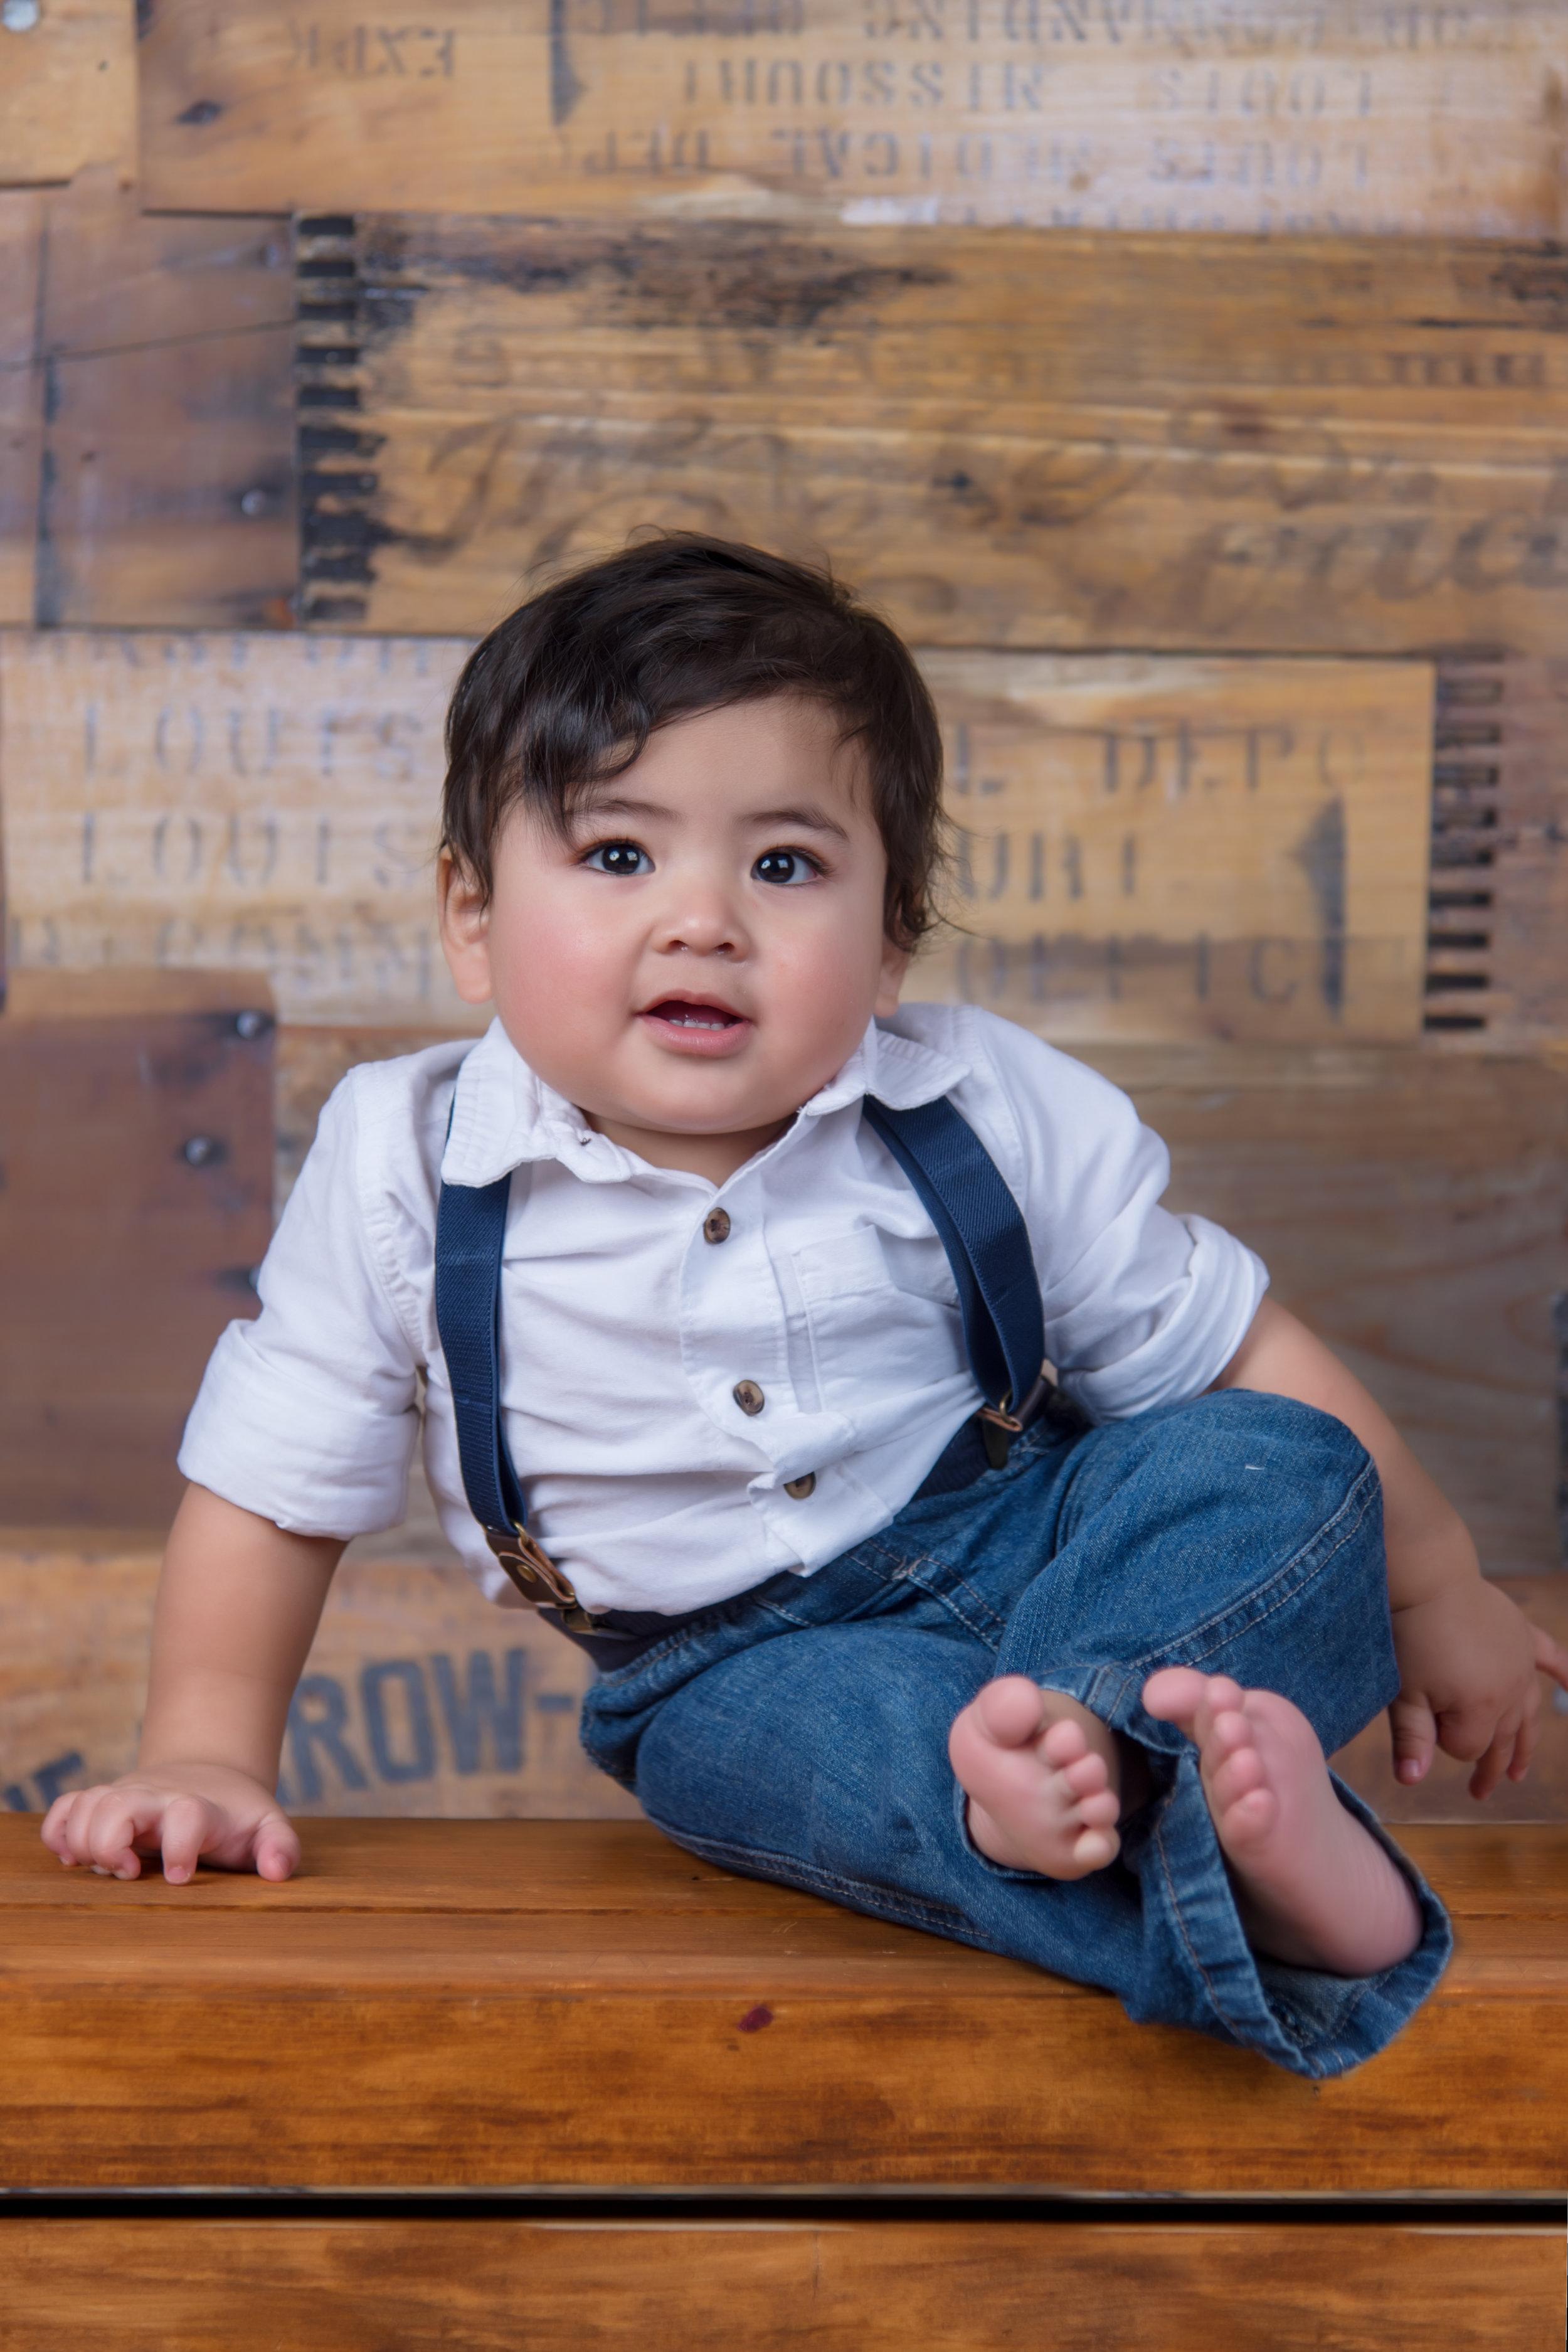 1st birthday portrait little boy in suspenders on crate wood